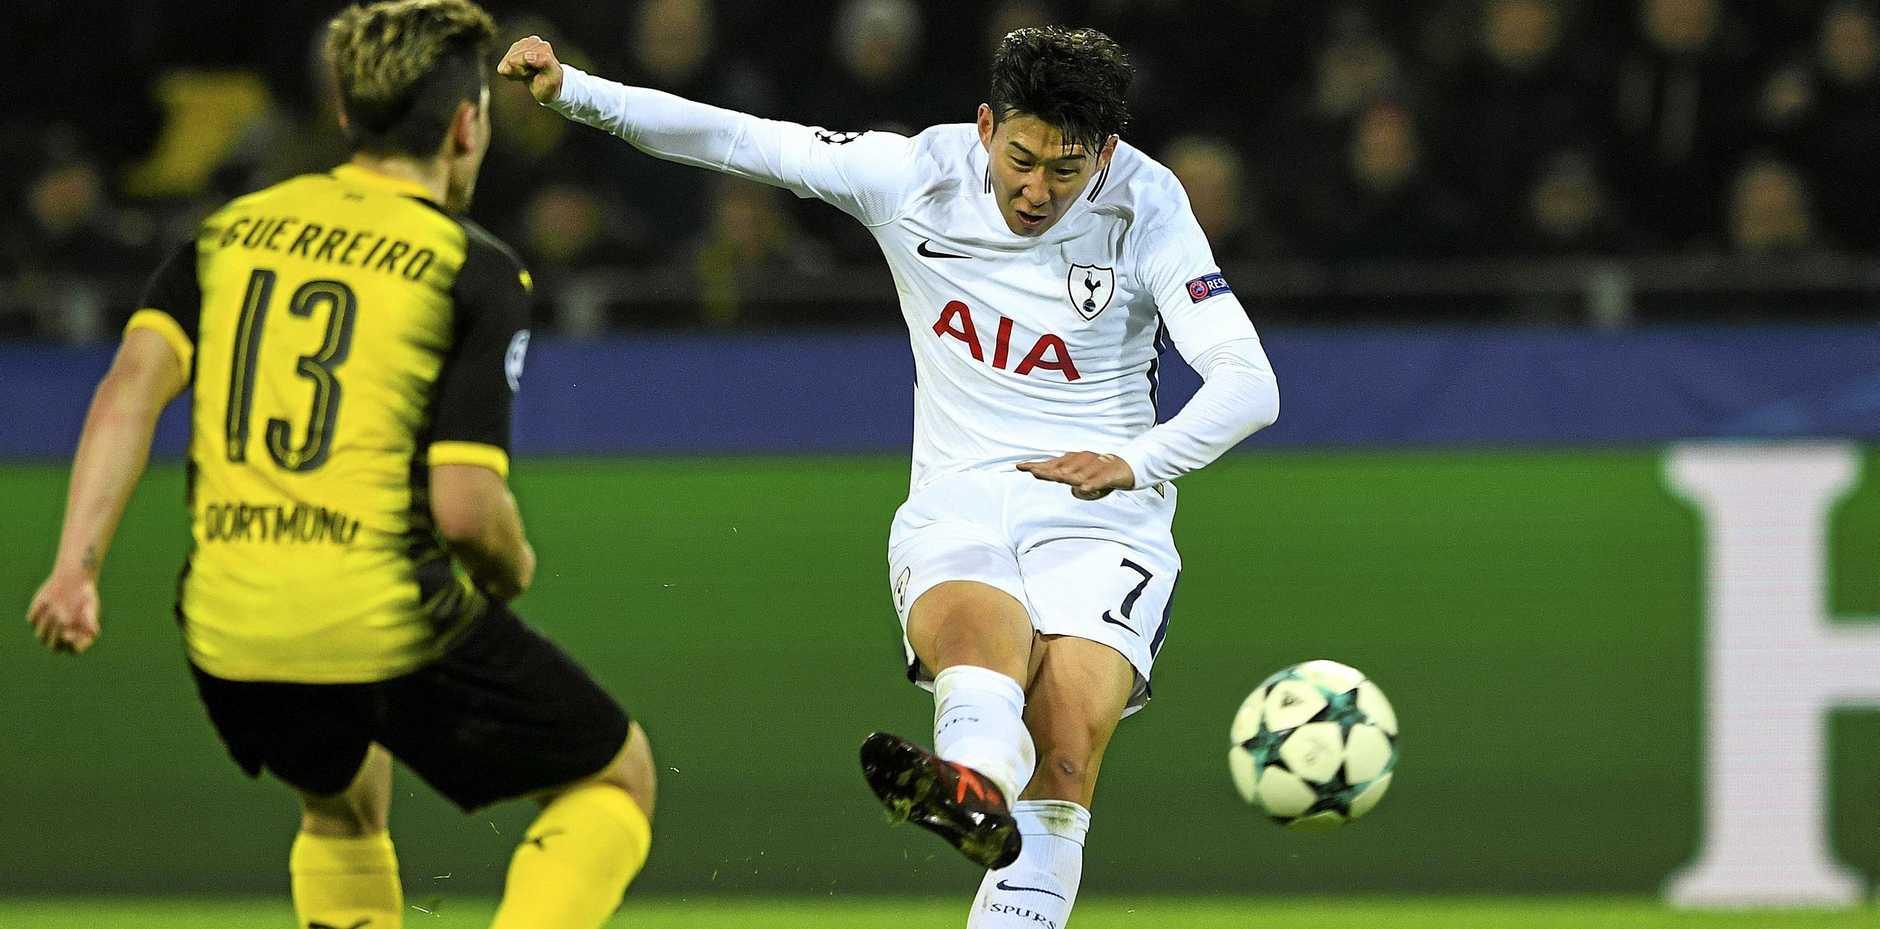 Tottenham's Heung-Min Son, right, scores a goal during the UEFA Champions League match against Borussia Dortmund.